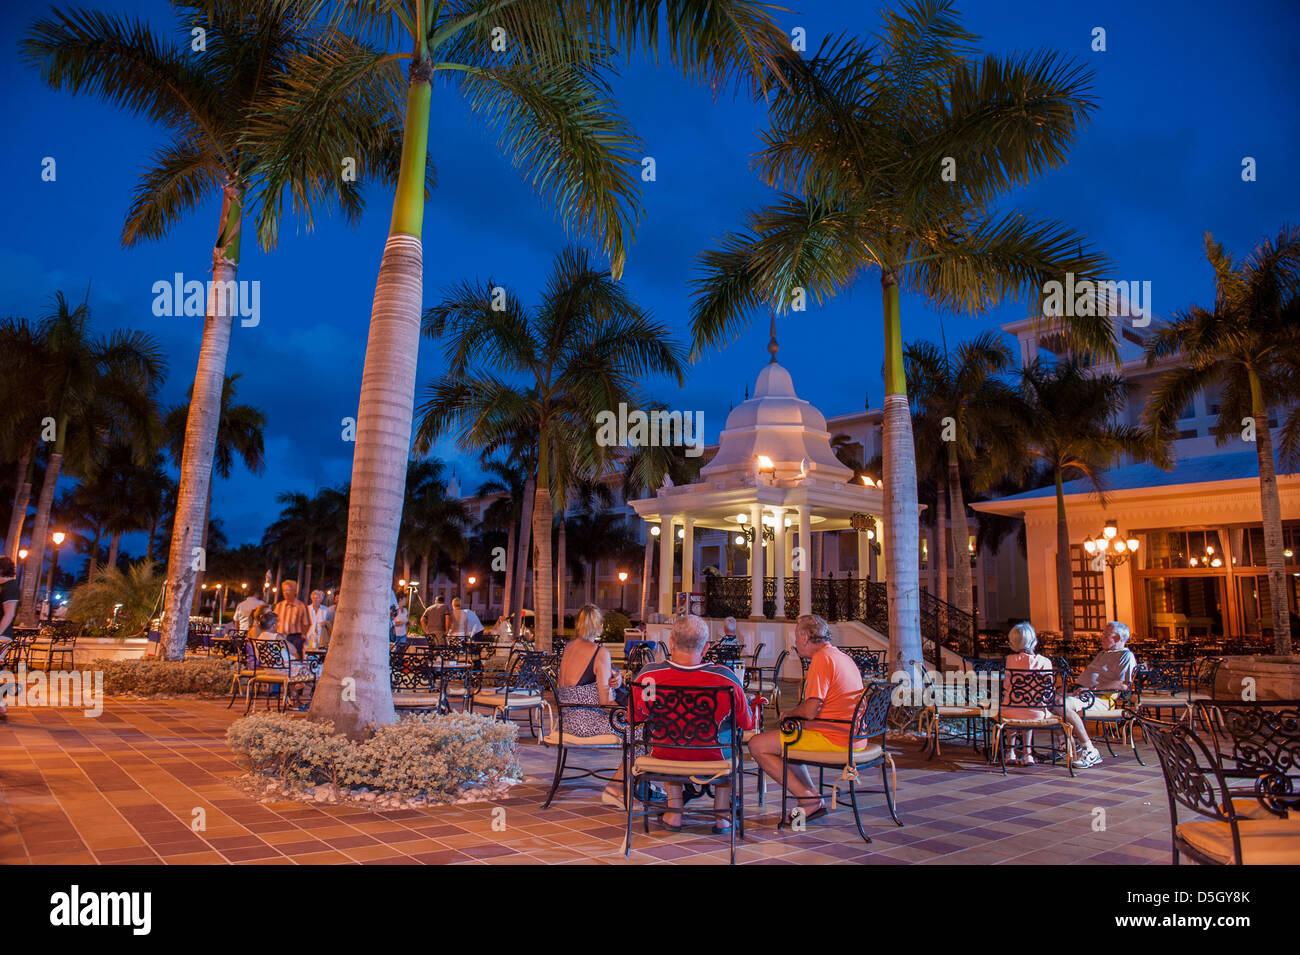 Repubblica Dominicana, Punta Cana, Higuey, Bavaro, Riu Palace, persone rilassante, piazza di sera Immagini Stock